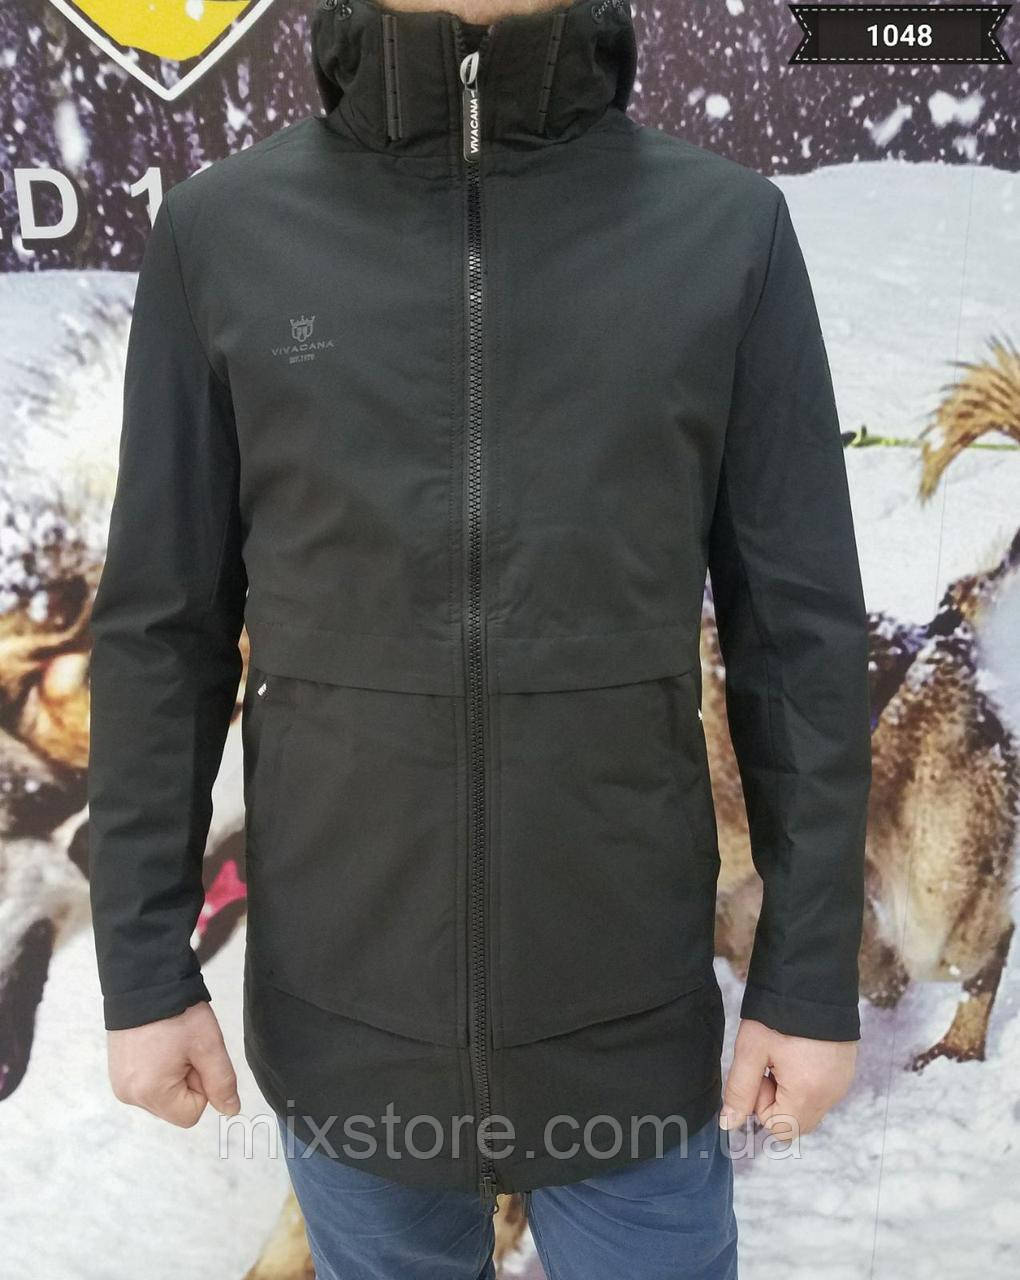 Куртка/парка длинная для мужчин ViVA CANA демисезонная/еврозима